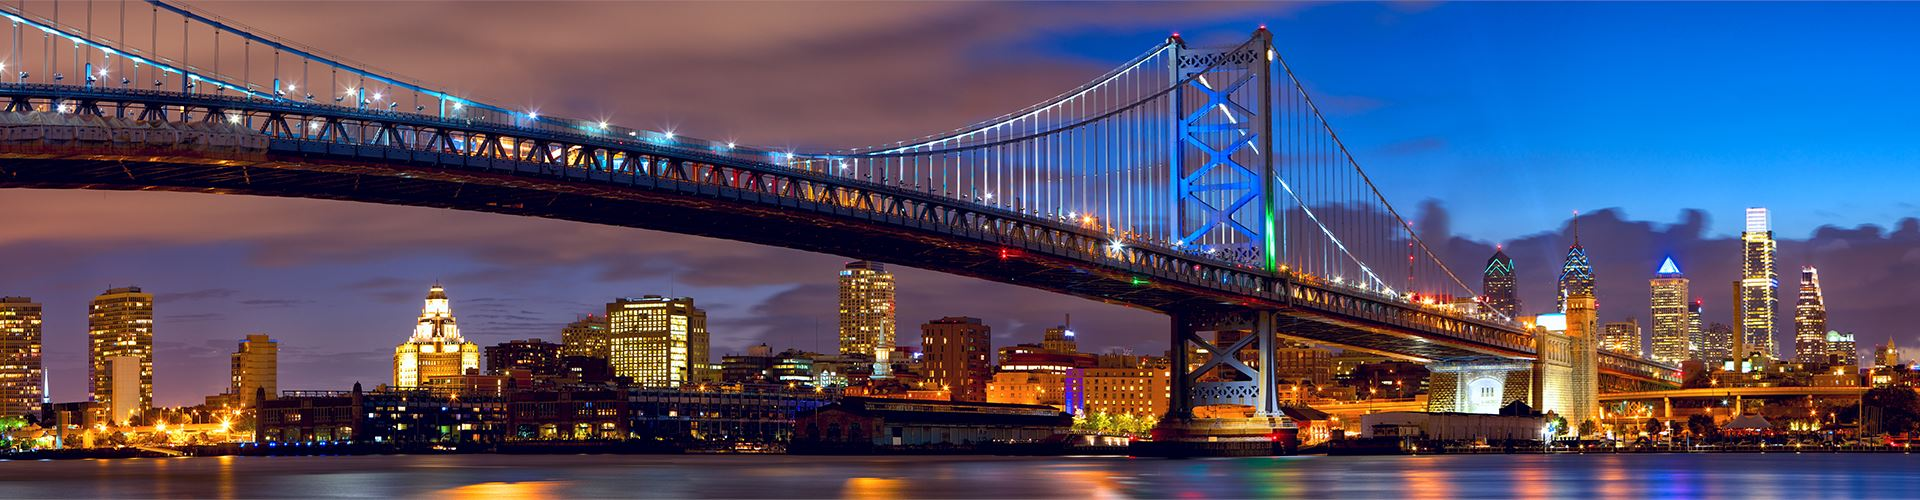 Philadelphia skyline panorama and Ben Franklin Bridge at dusk